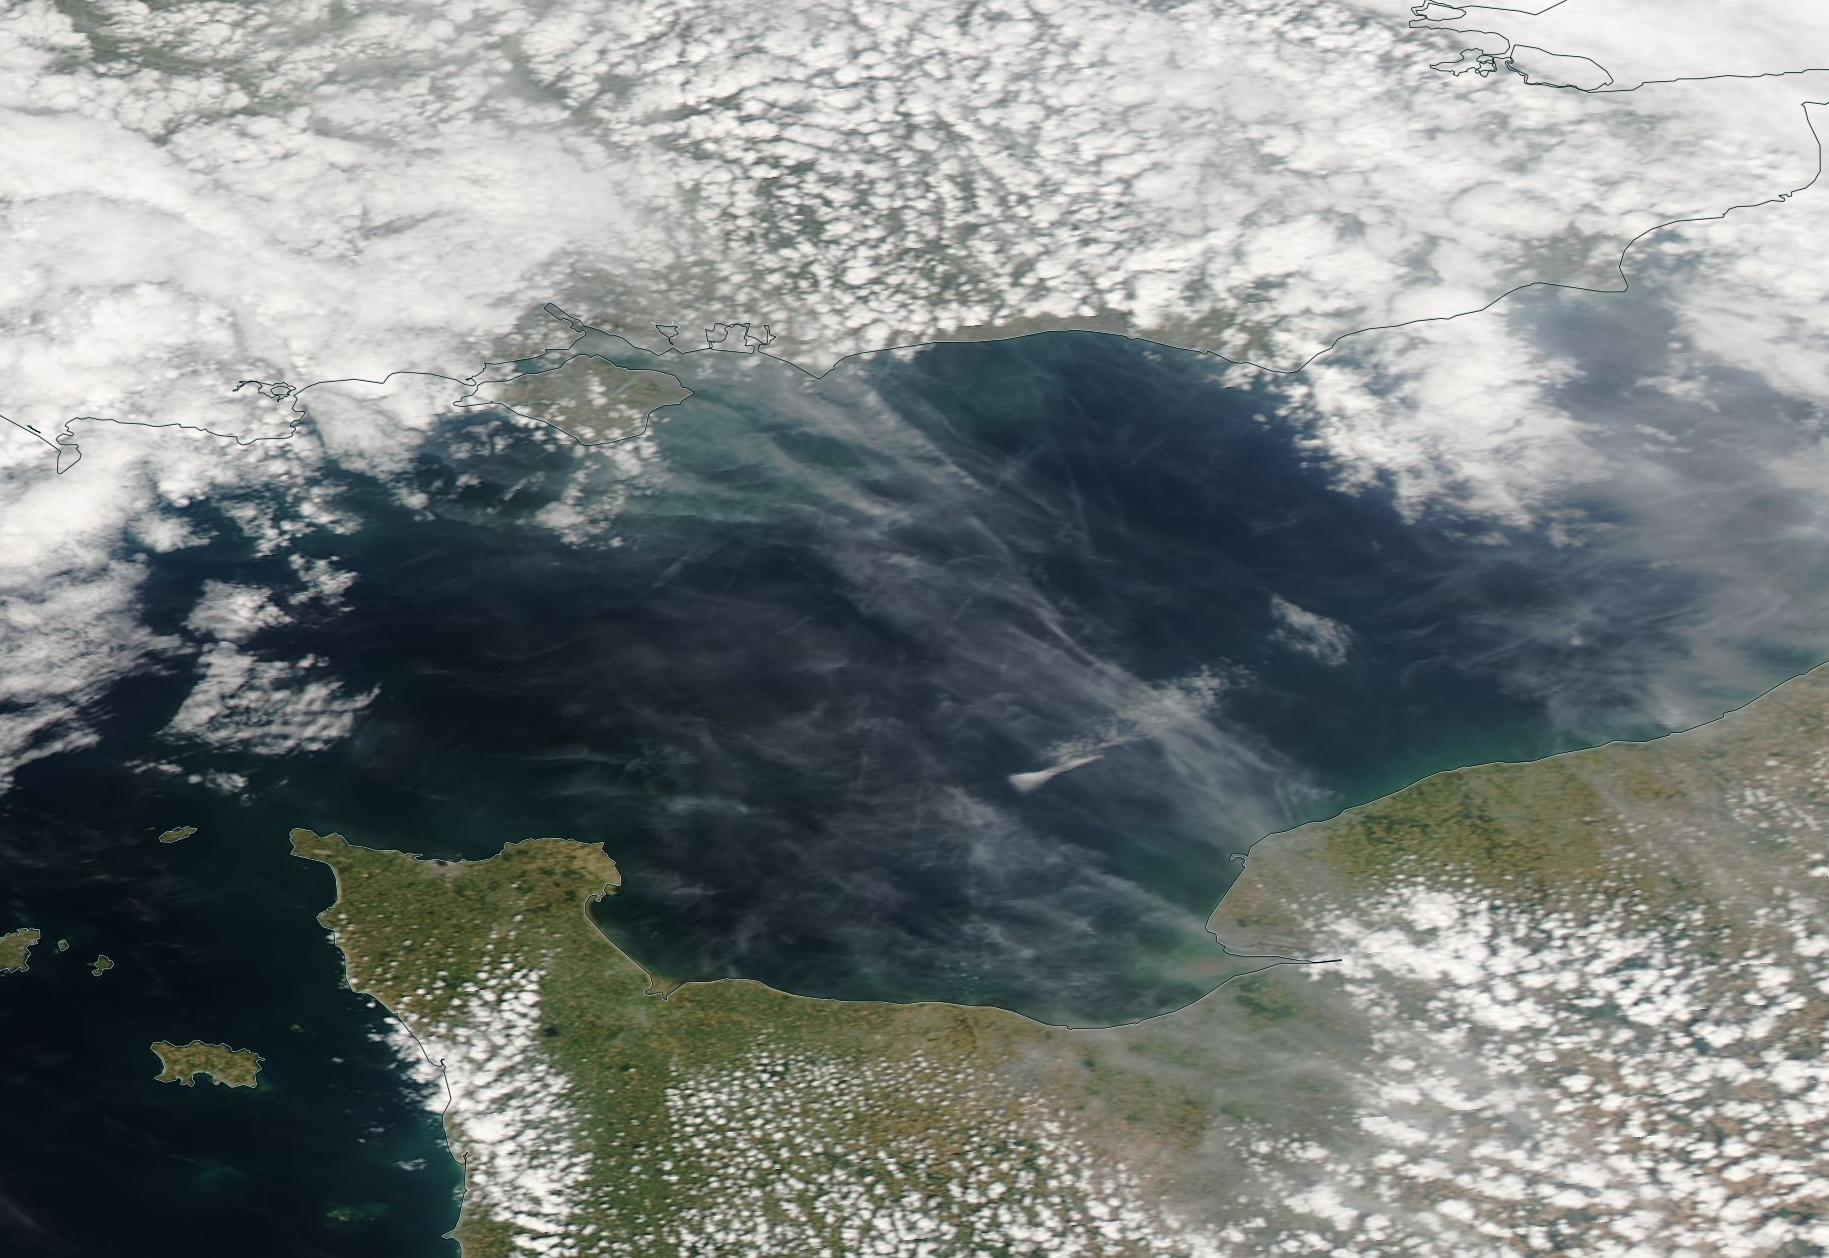 Le Havre, Dieppe, English Channel chemtrail geoengineering 13 July 2019. https://go.nasa.gov/2JKyYcM